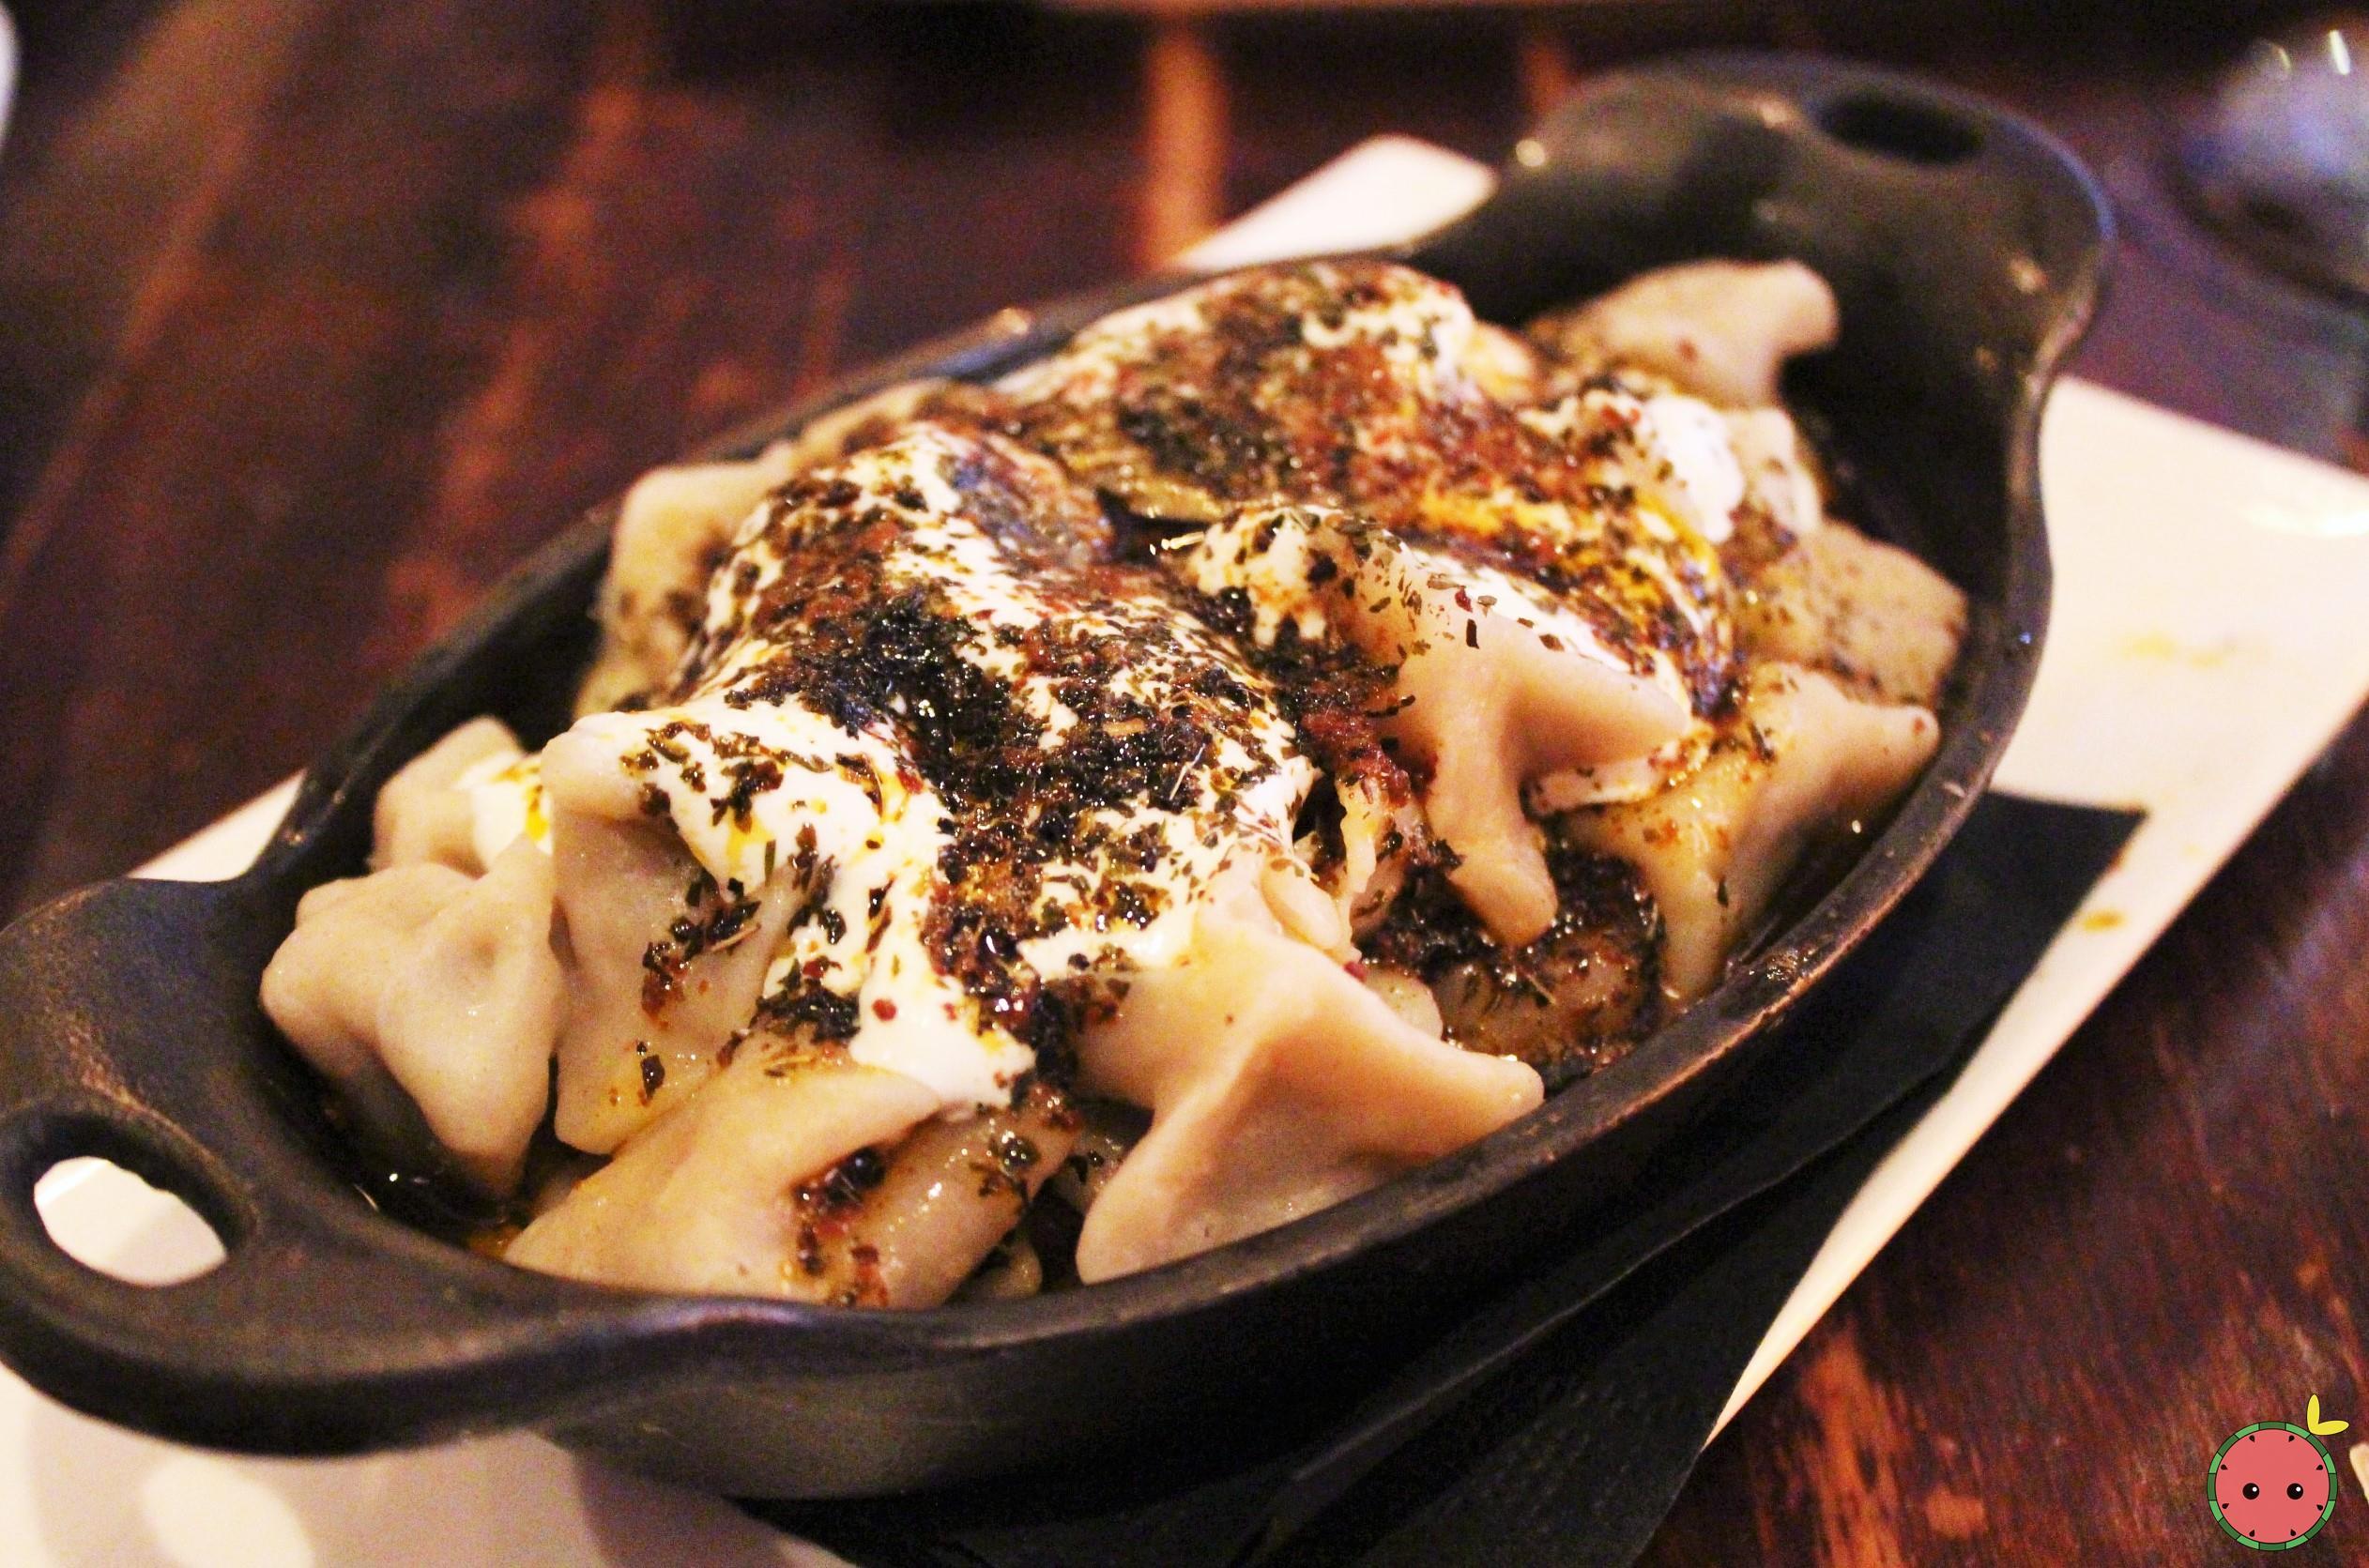 Manti - Turkish beef dumplings with yogurt, butter, dry herbs